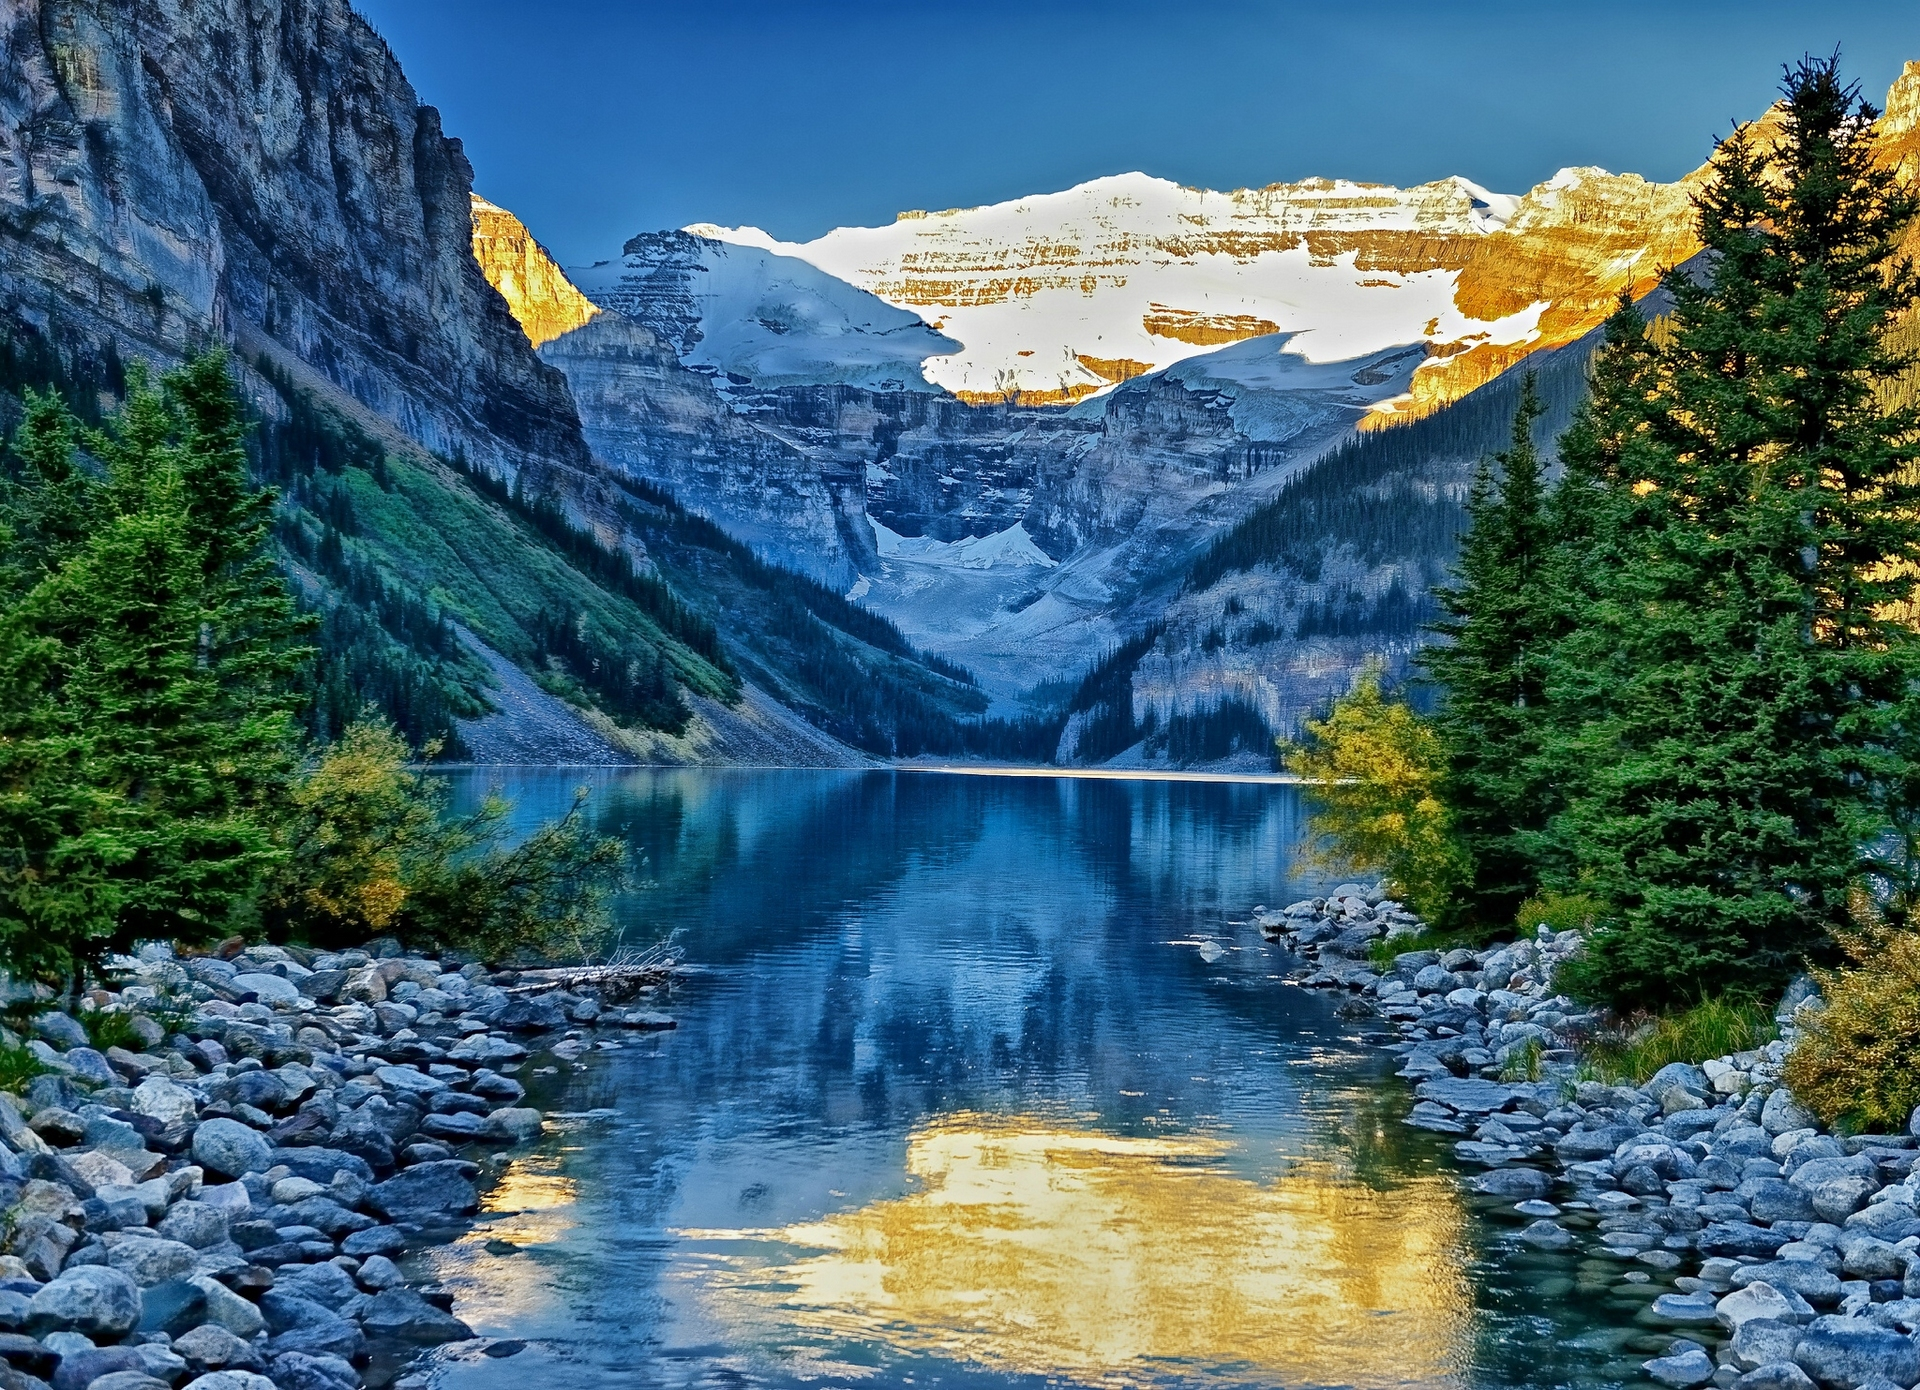 Wallpaper lake louise banff national park alberta canada alberta 1920x1390